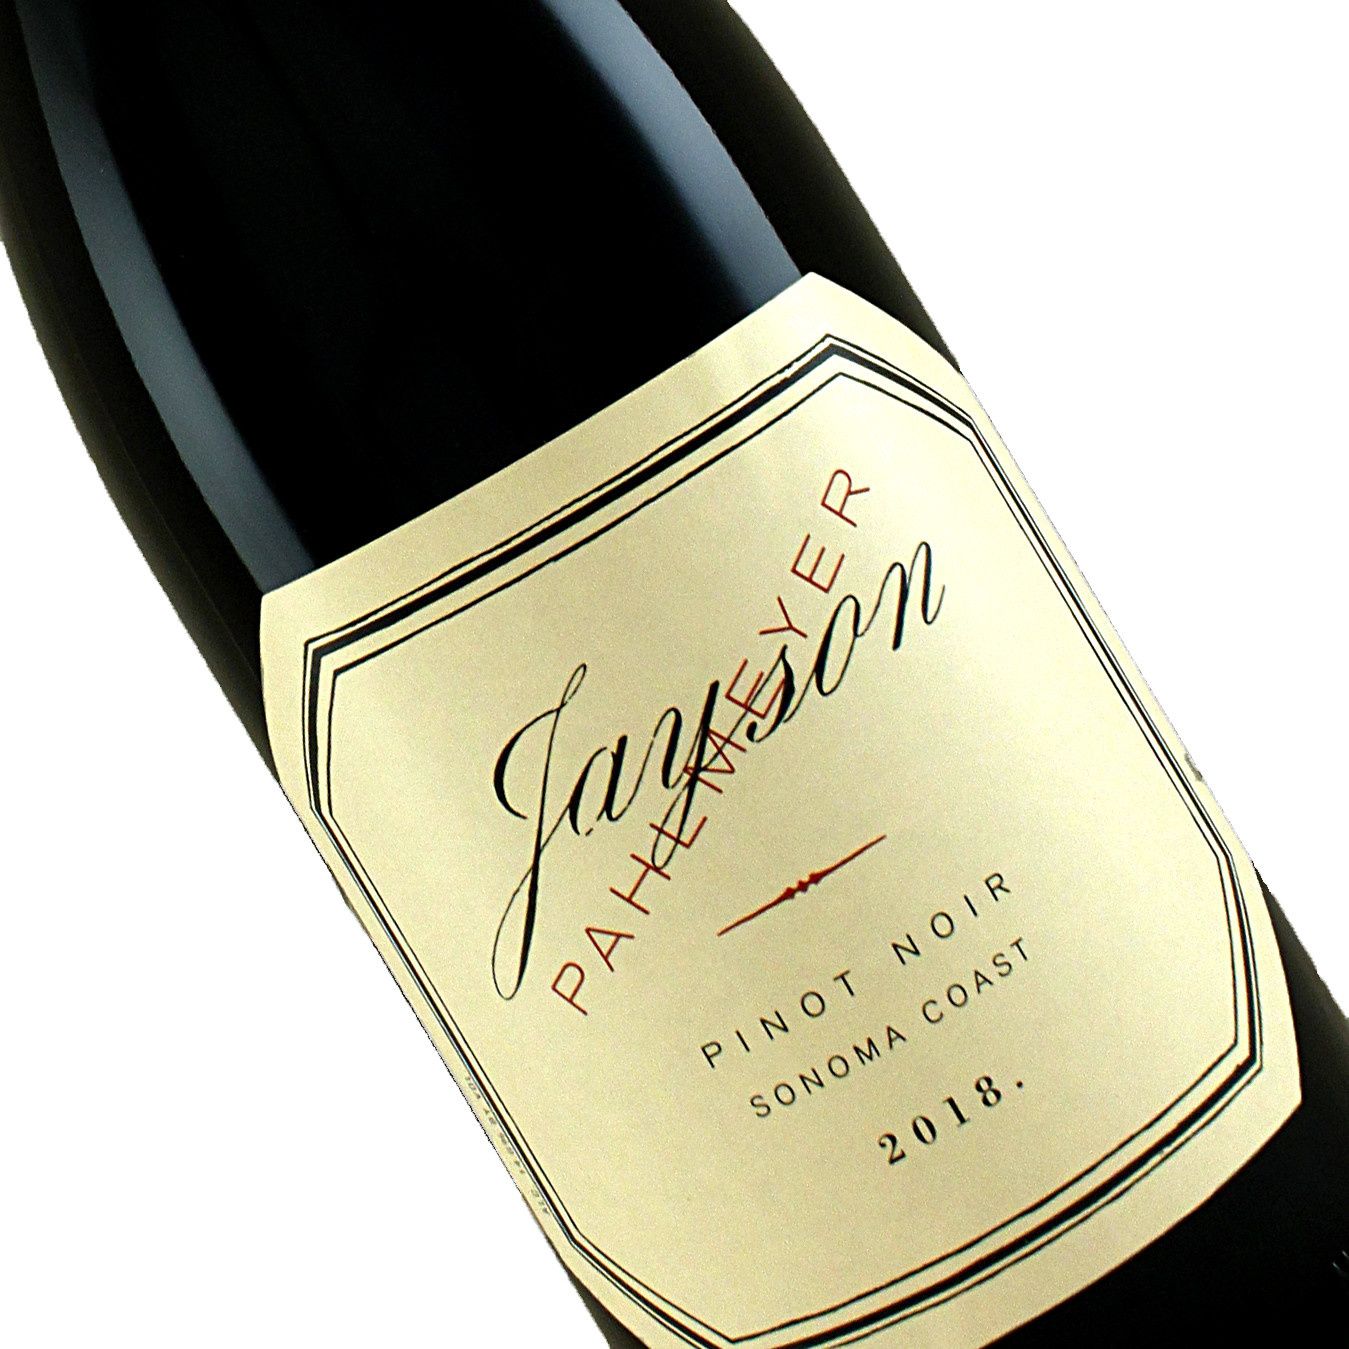 Jayson by Pahlmeyer 2018 Pinot Noir, Sonoma Coast